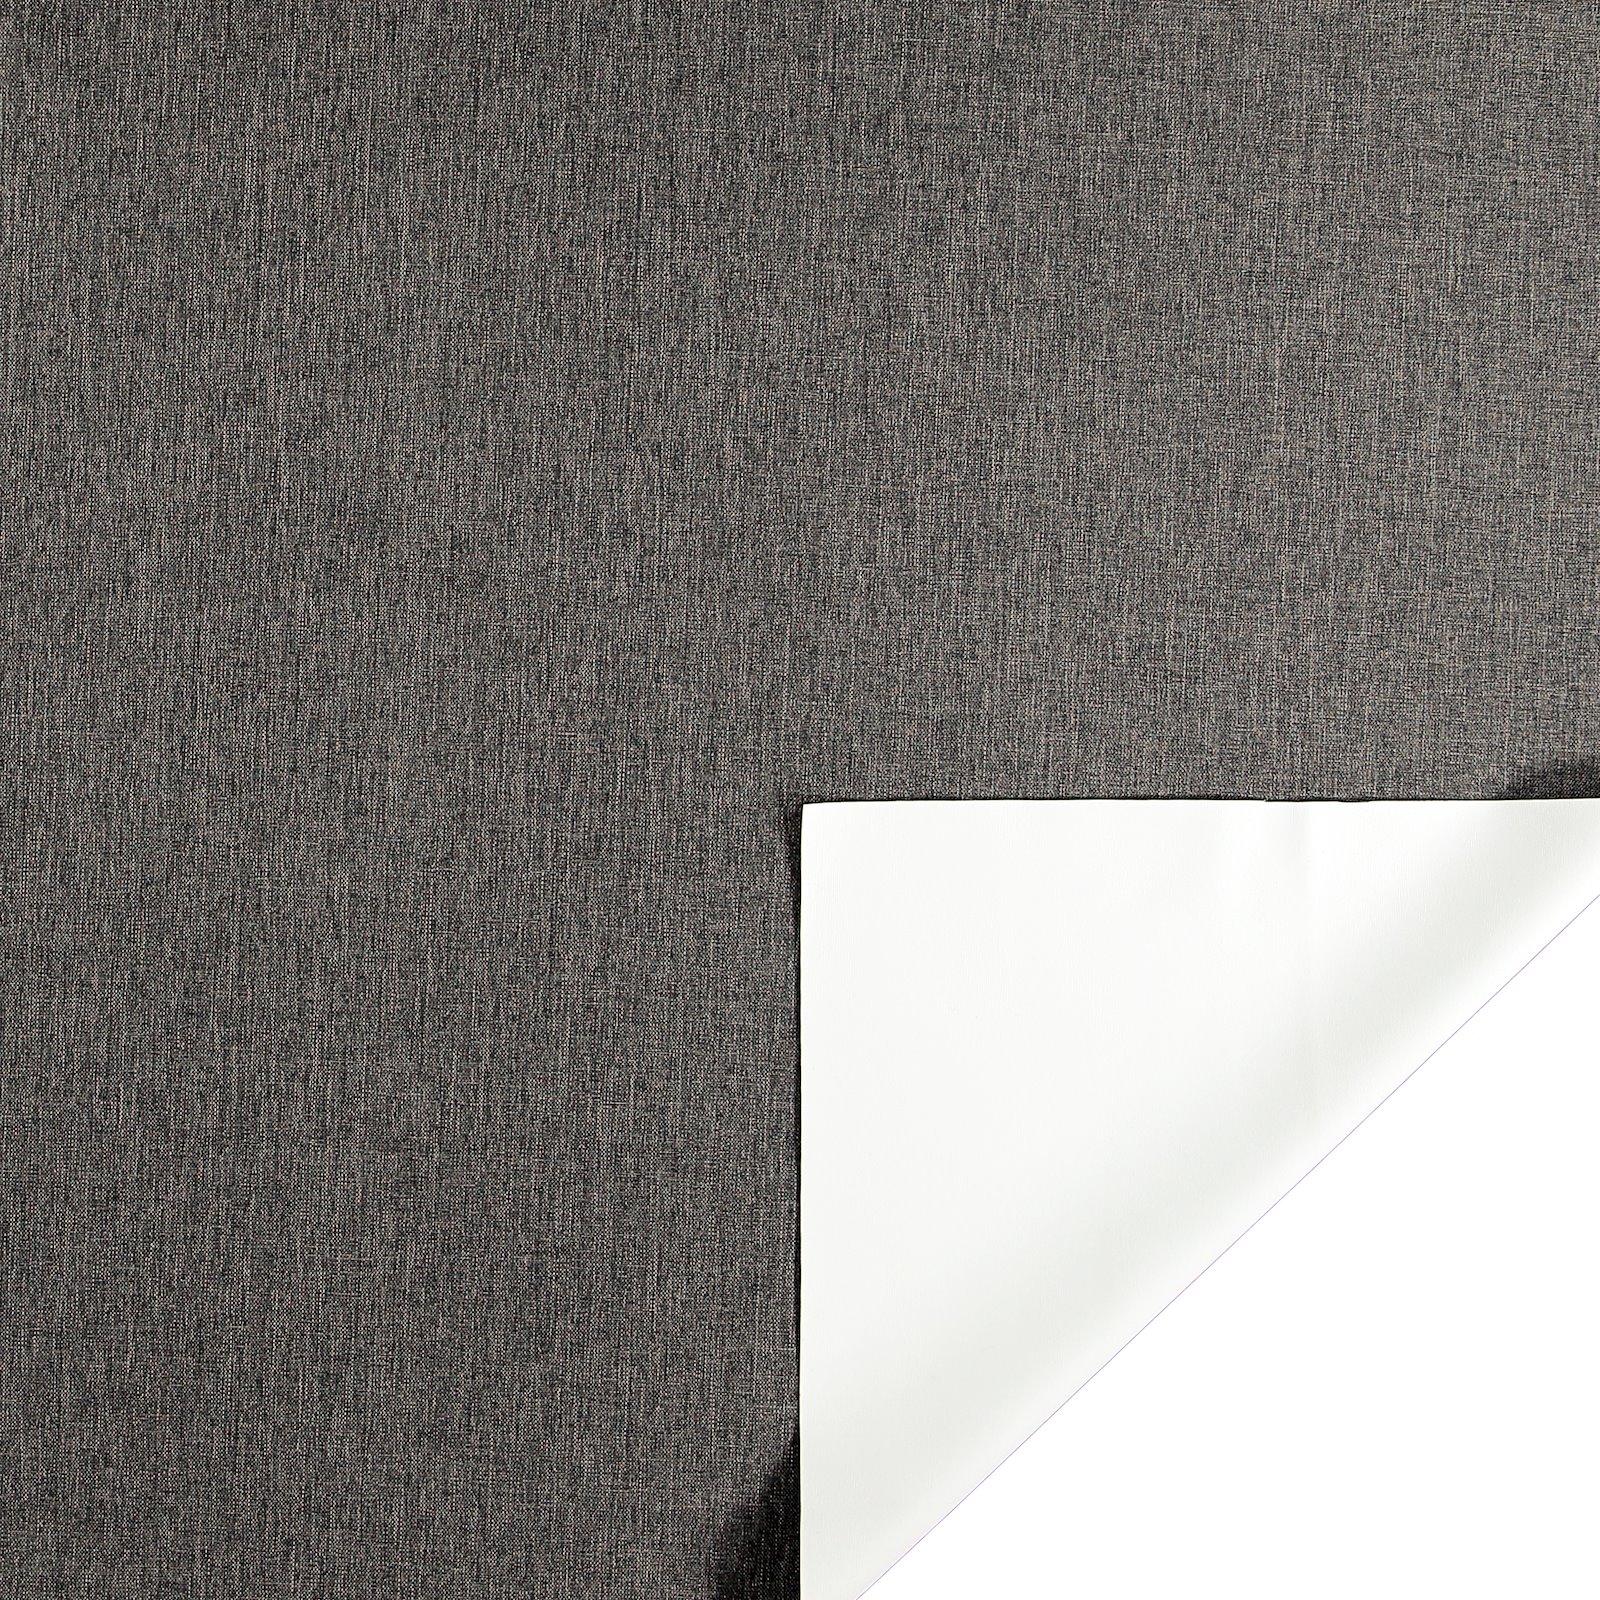 Blackout dk grey w white backing 880013_pack_lp